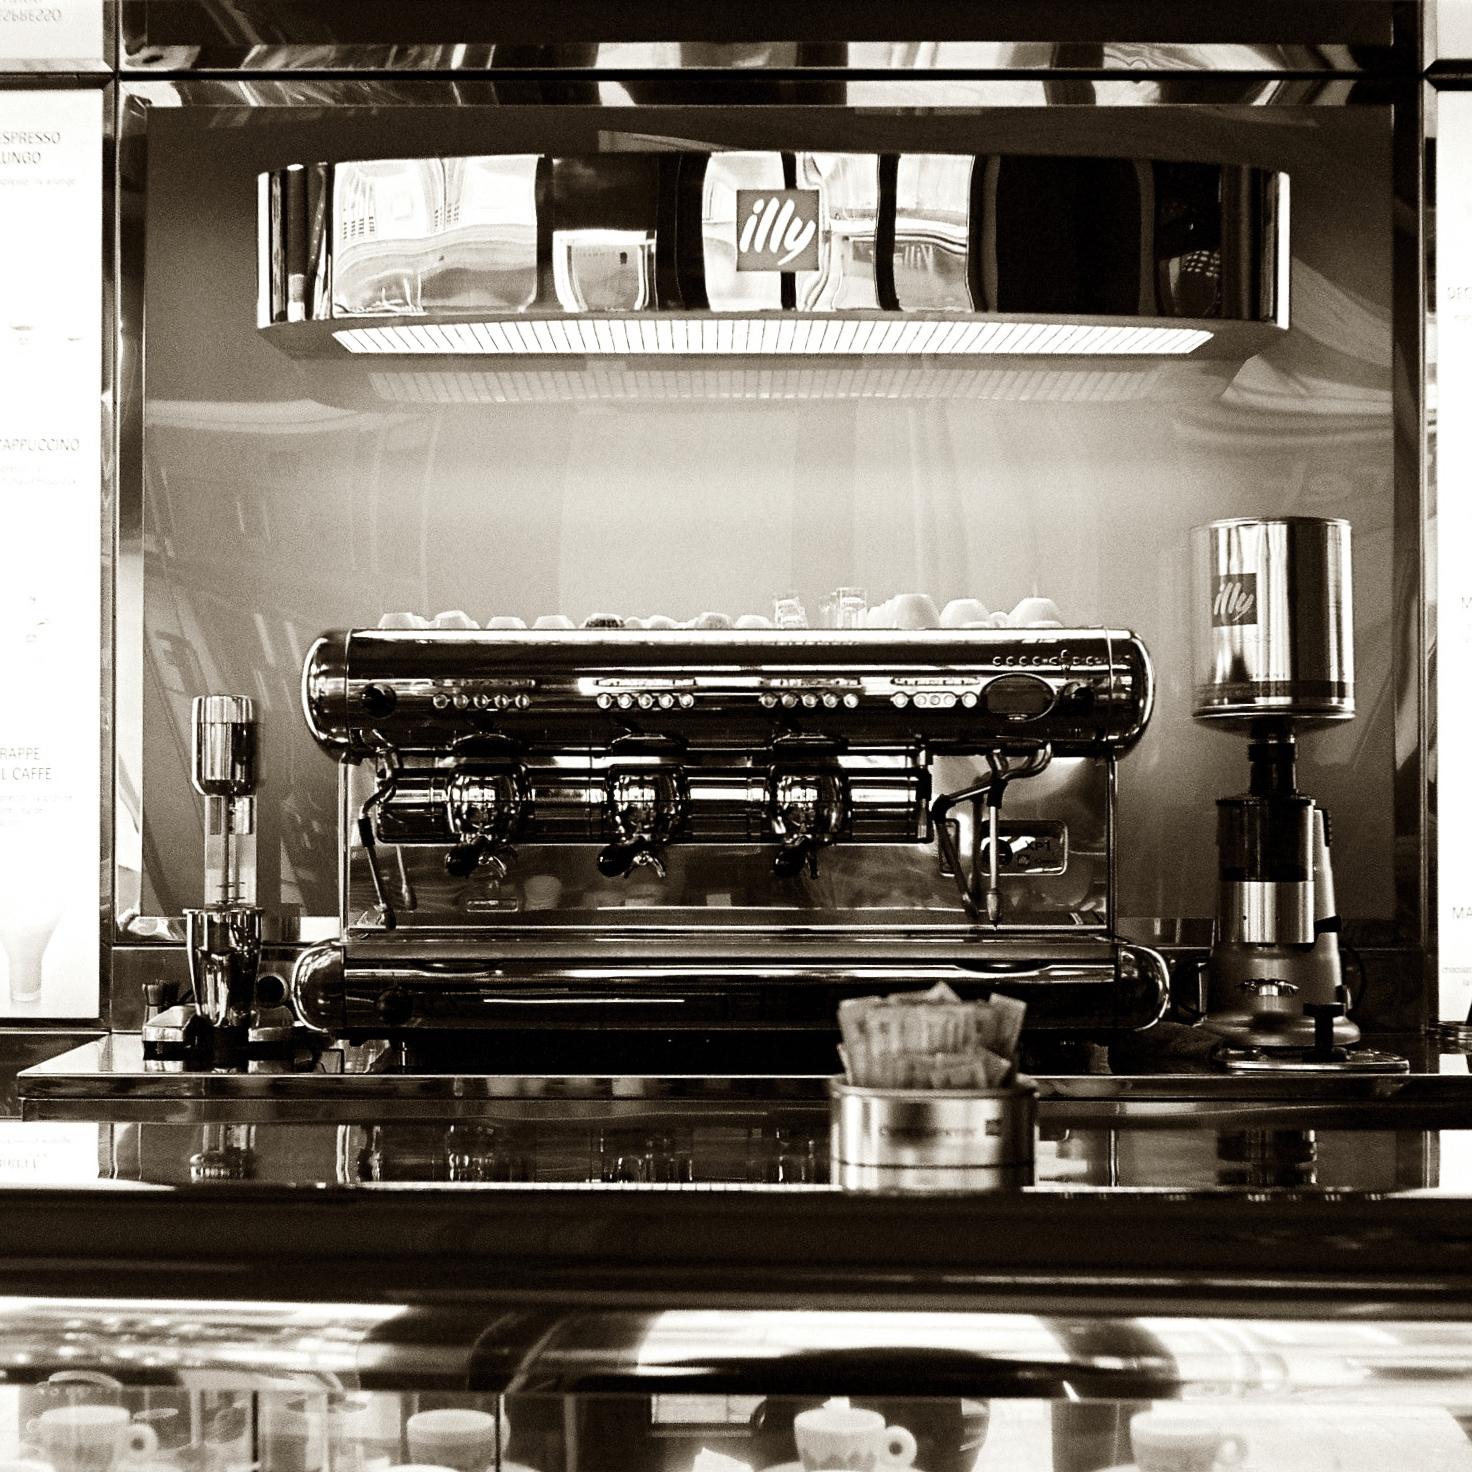 illyespressomachine.jpg